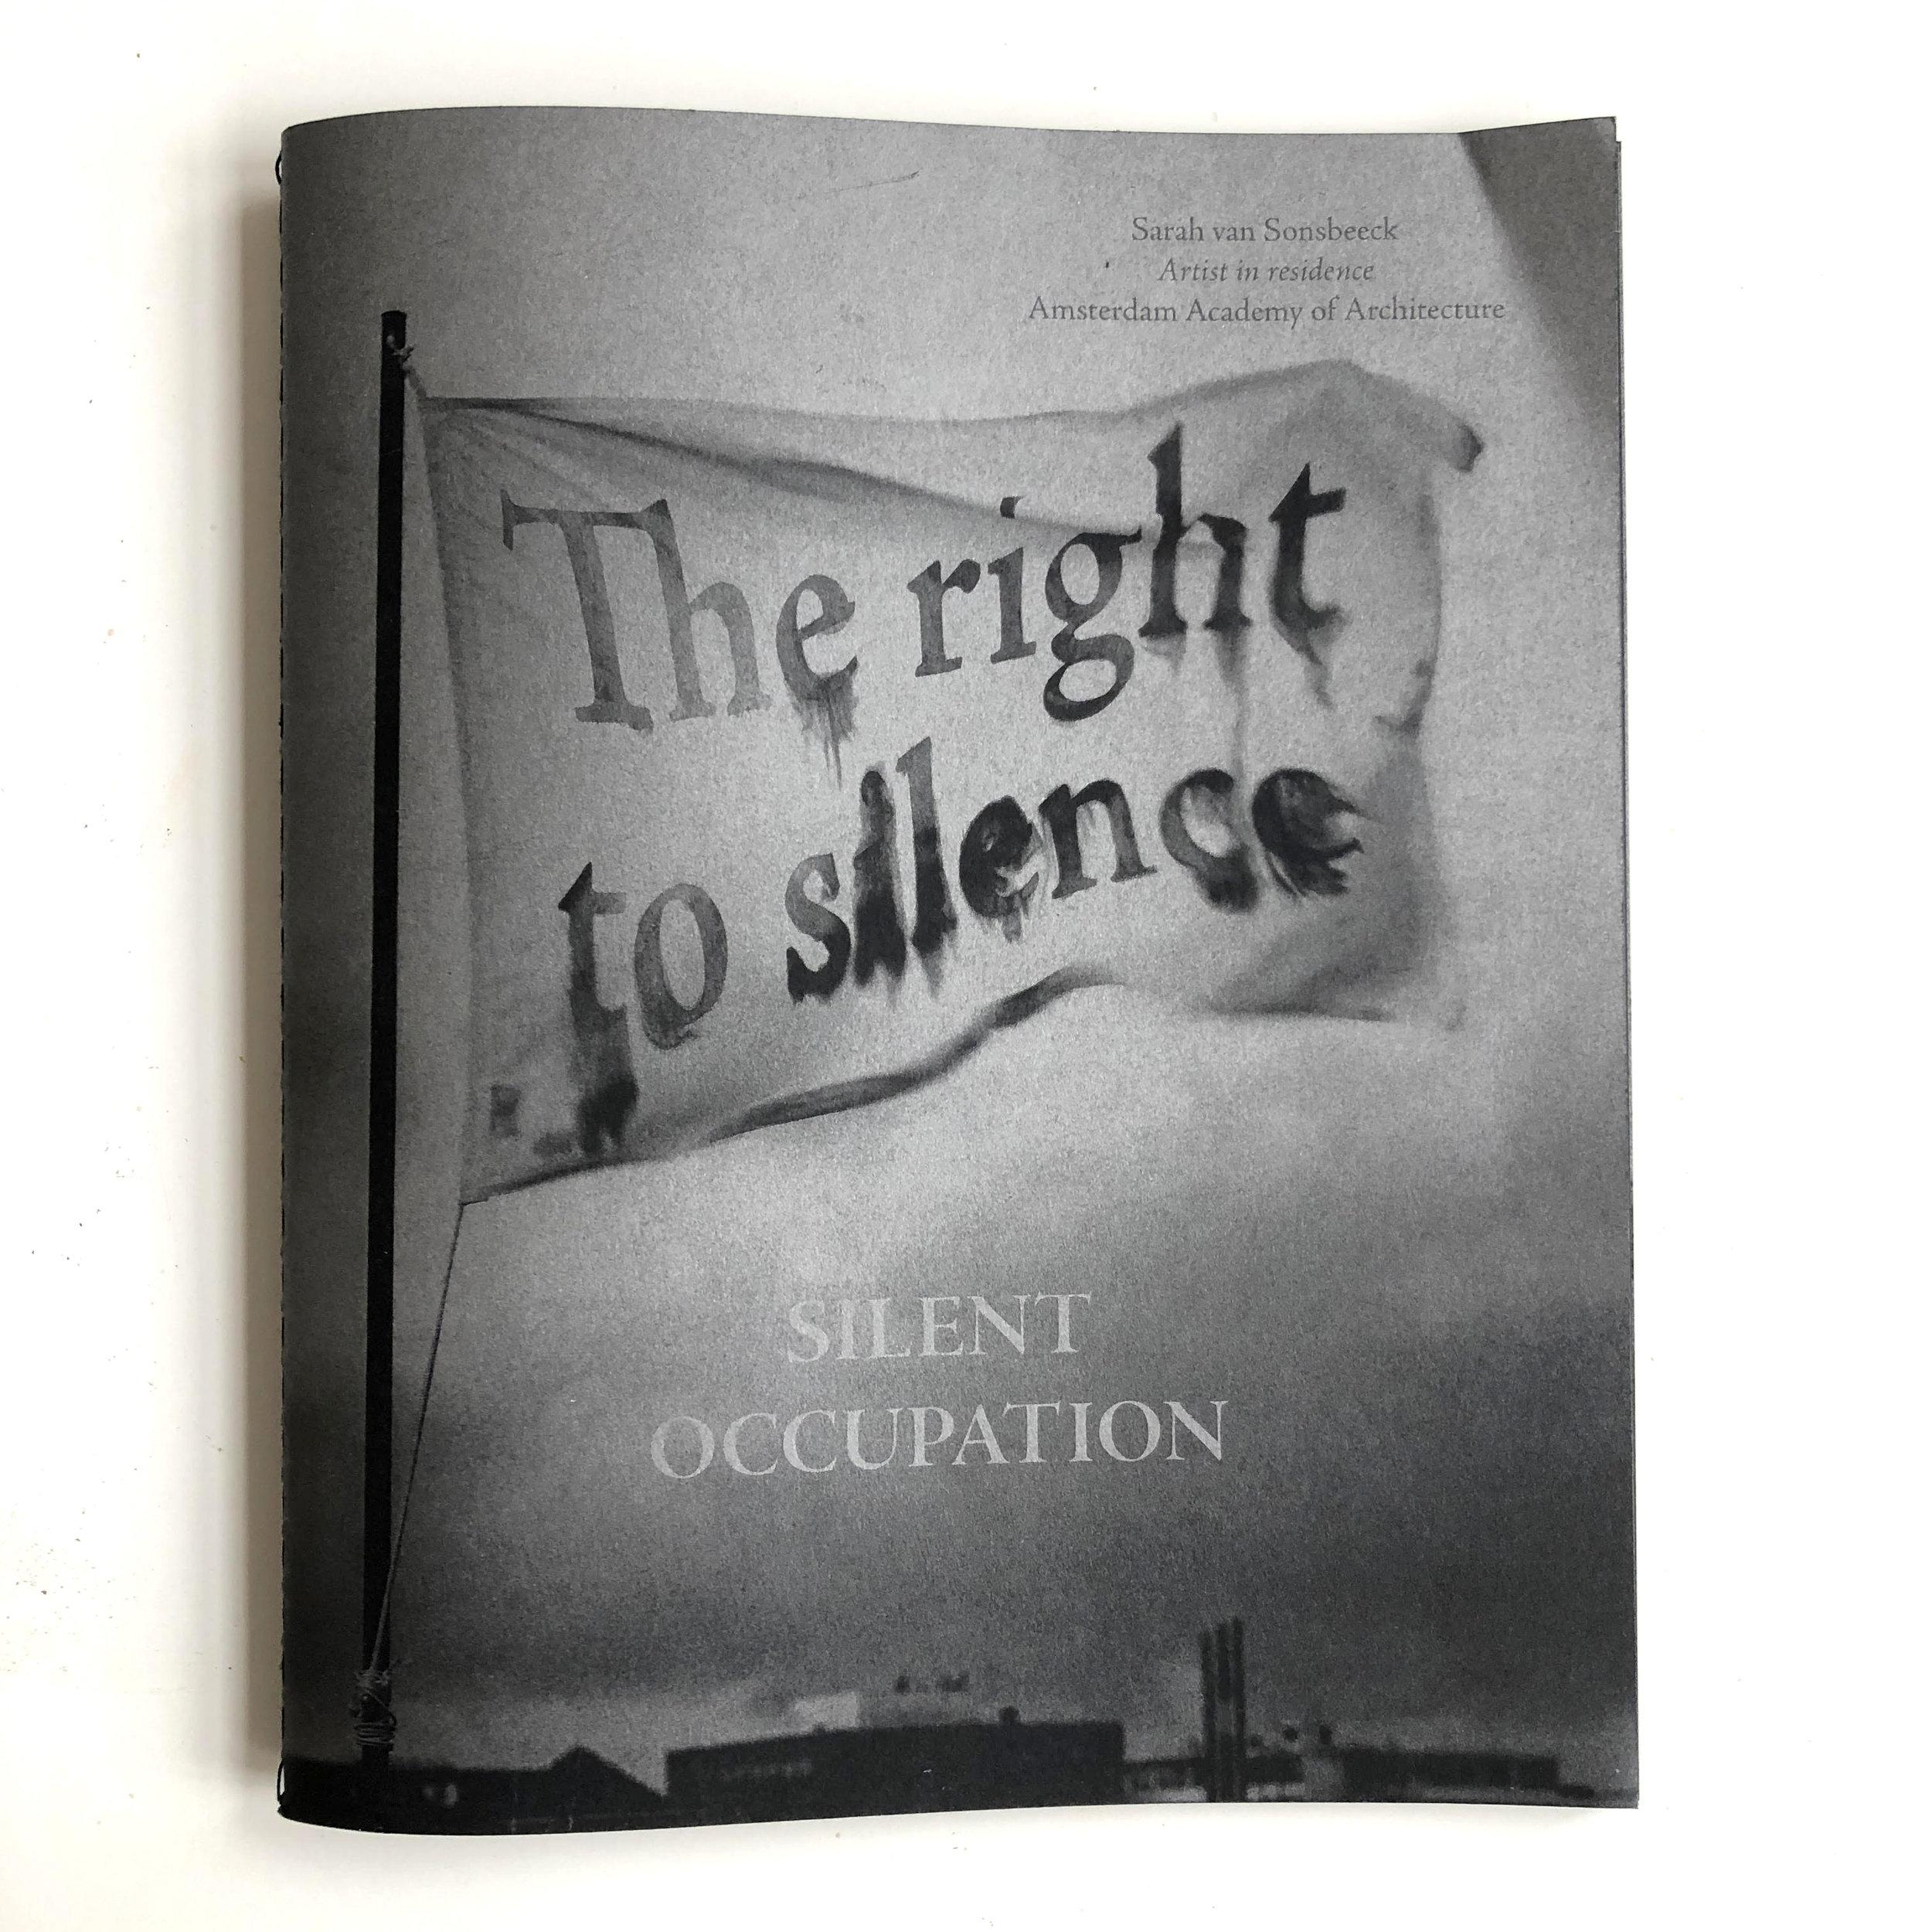 Silent Occupation artist book